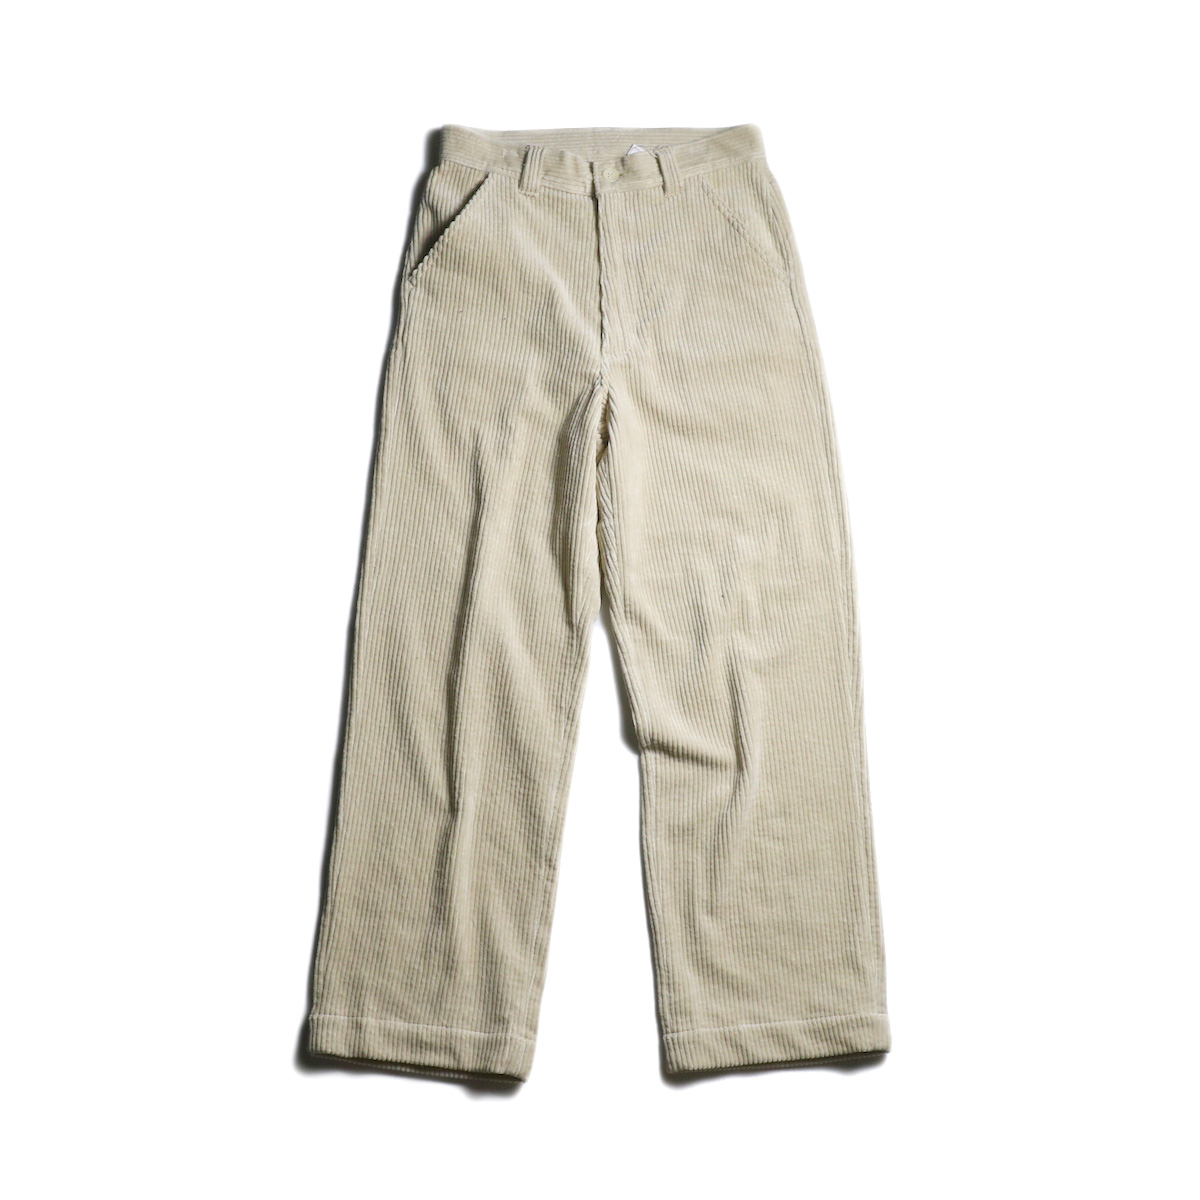 EVCON / CORDUROY WIDE PANTS (Ivory)